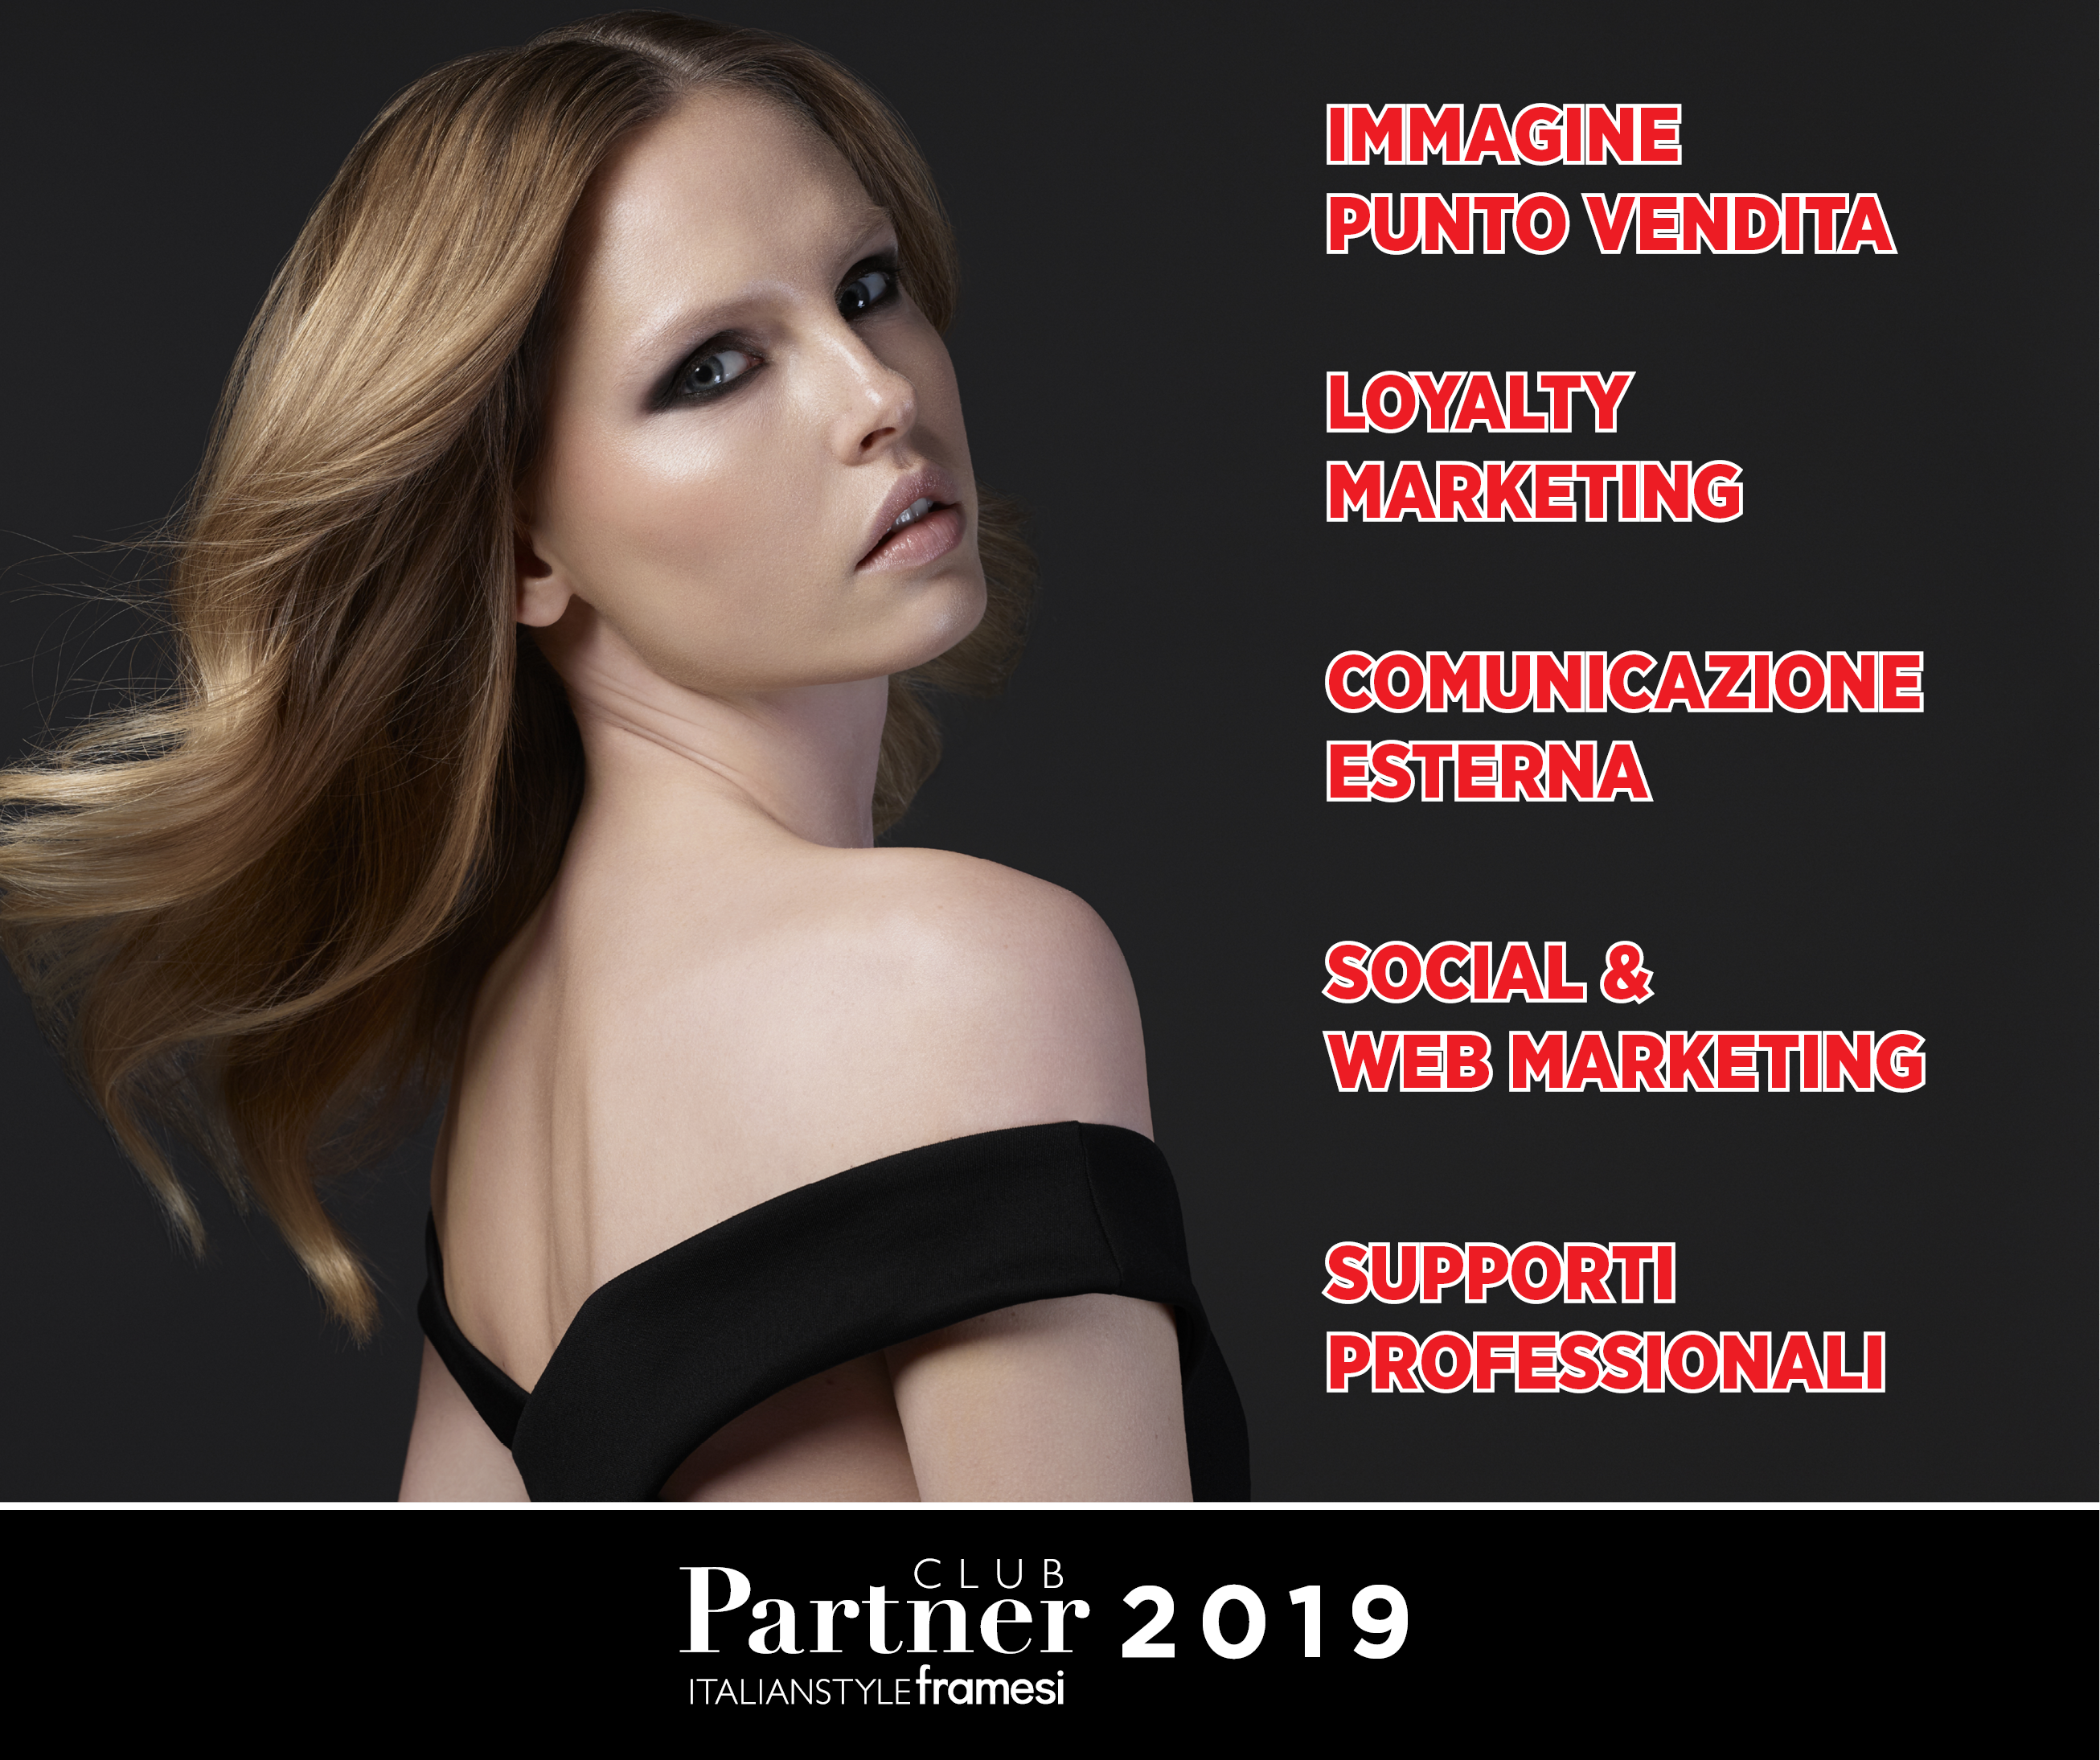 Partner Club Italian Style 2019